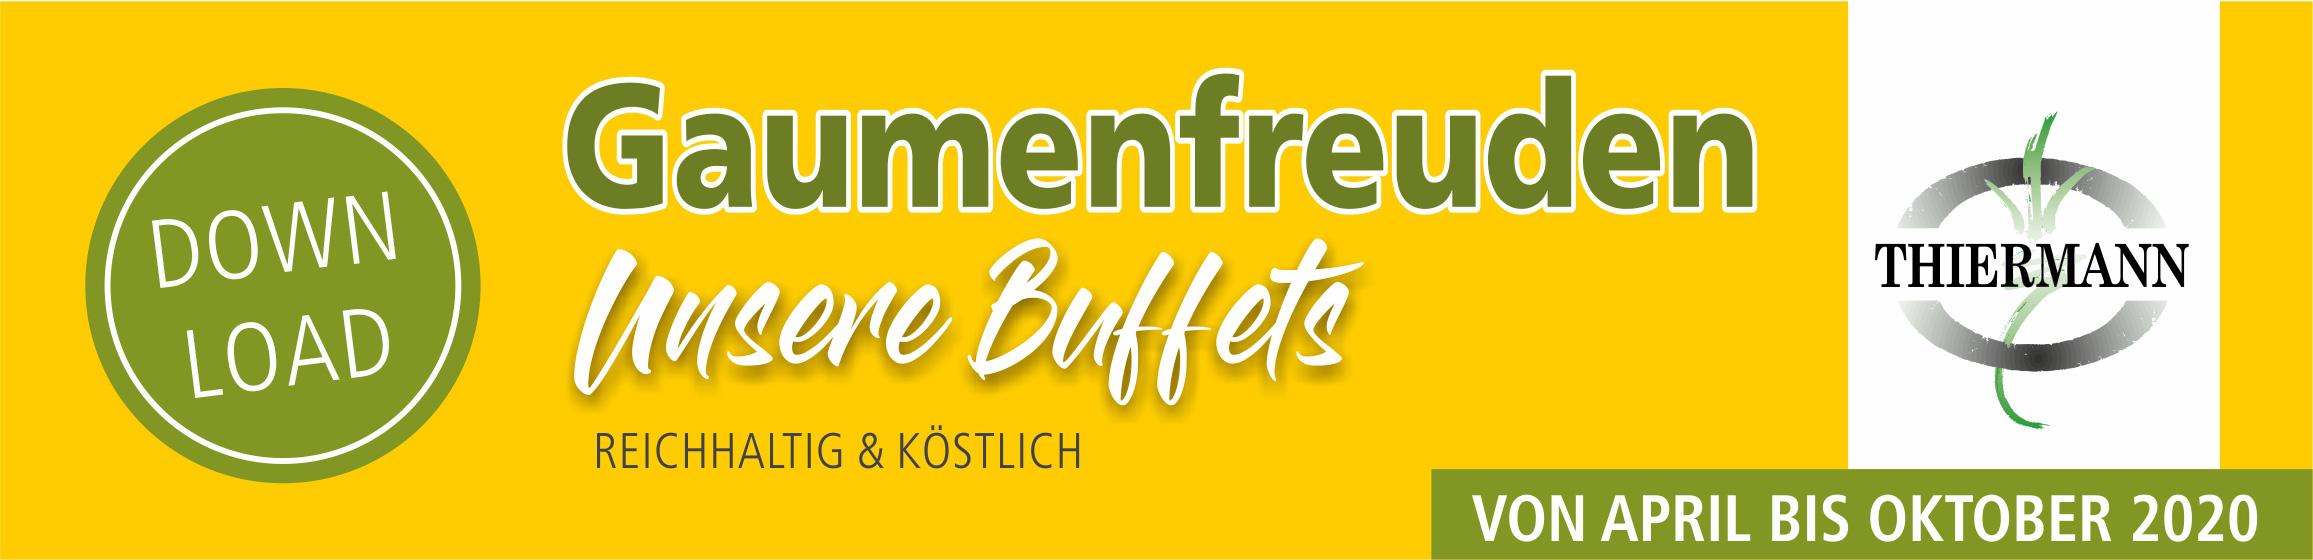 gaumenfreuden_2020_download